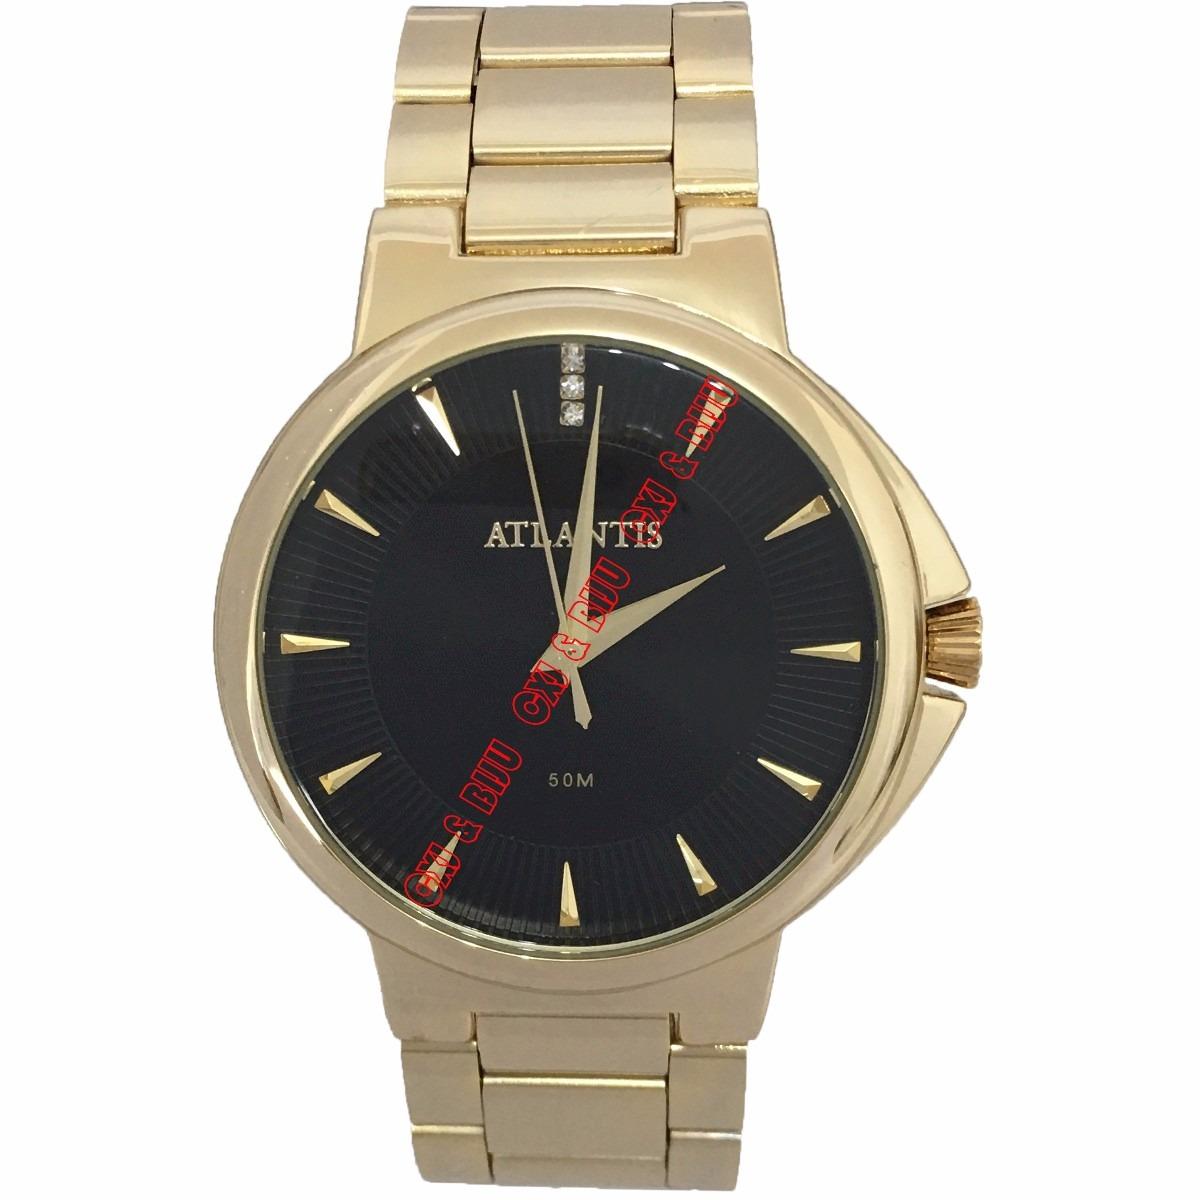 7a5f5678b33 Relógio Feminino Atlantis Aço Folheado Ouro Diametro 4